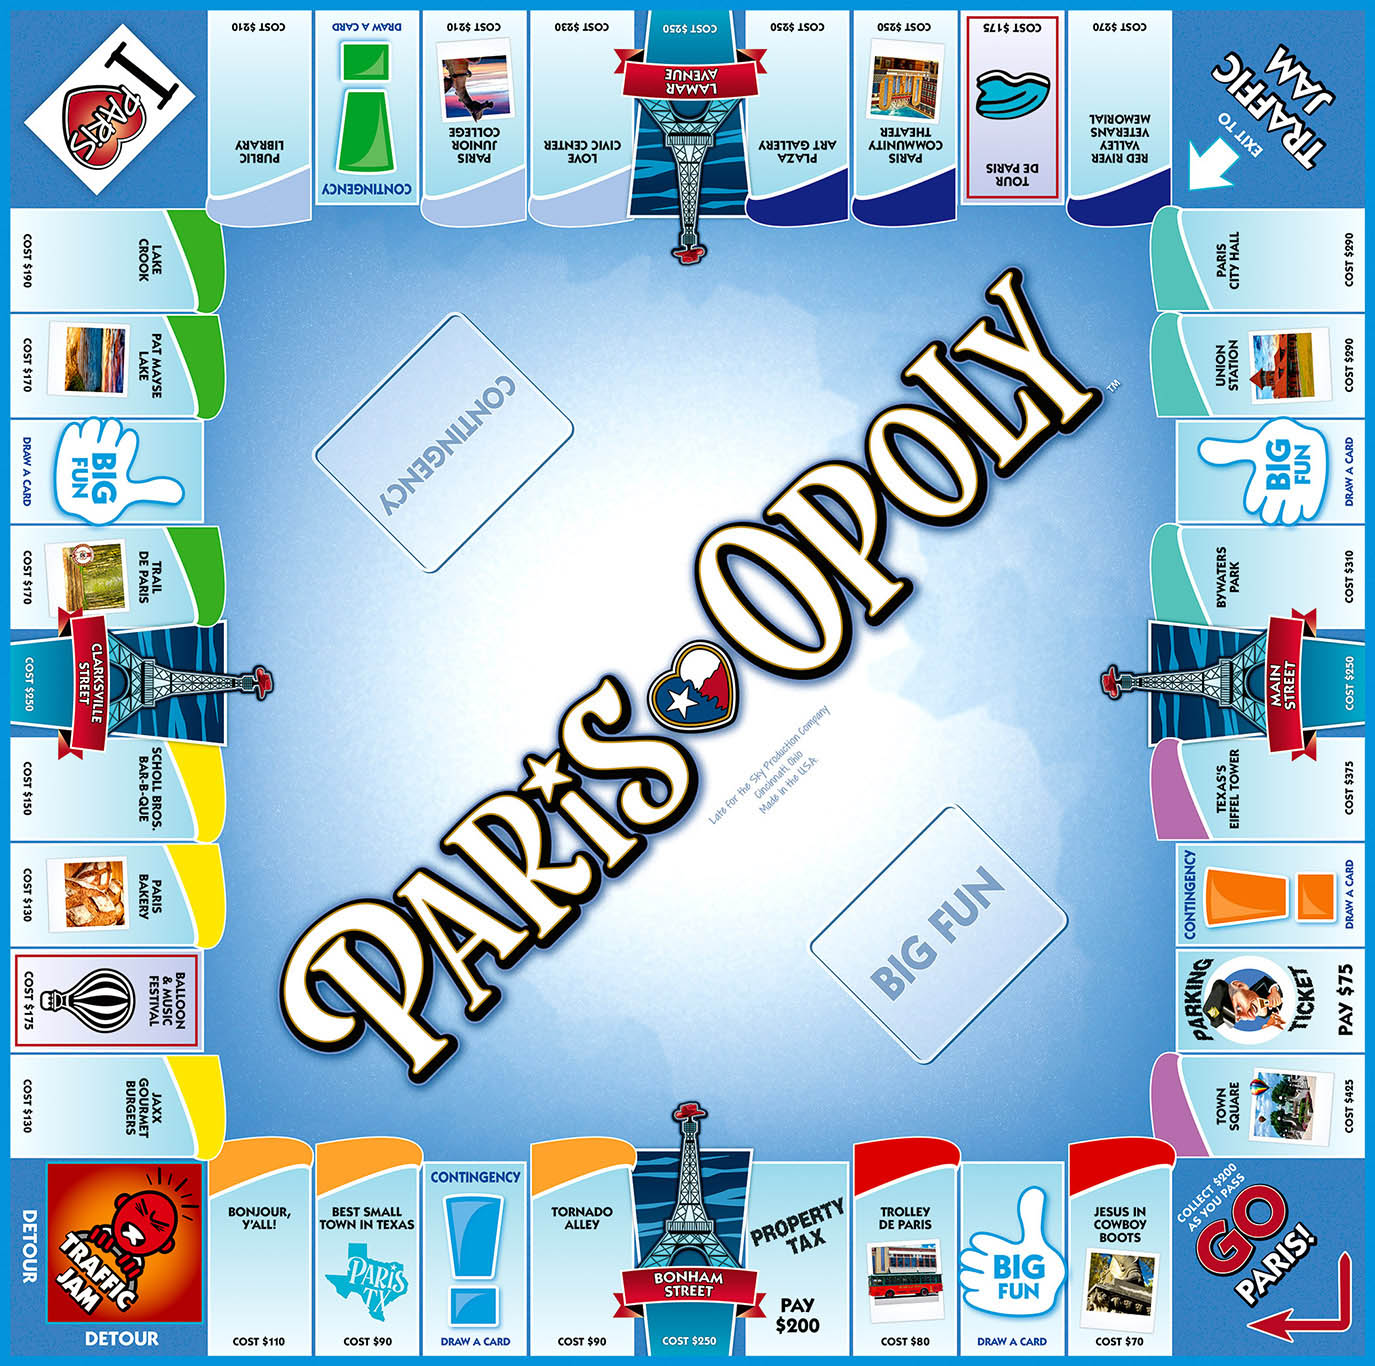 PARIS-OPOLY Board Game